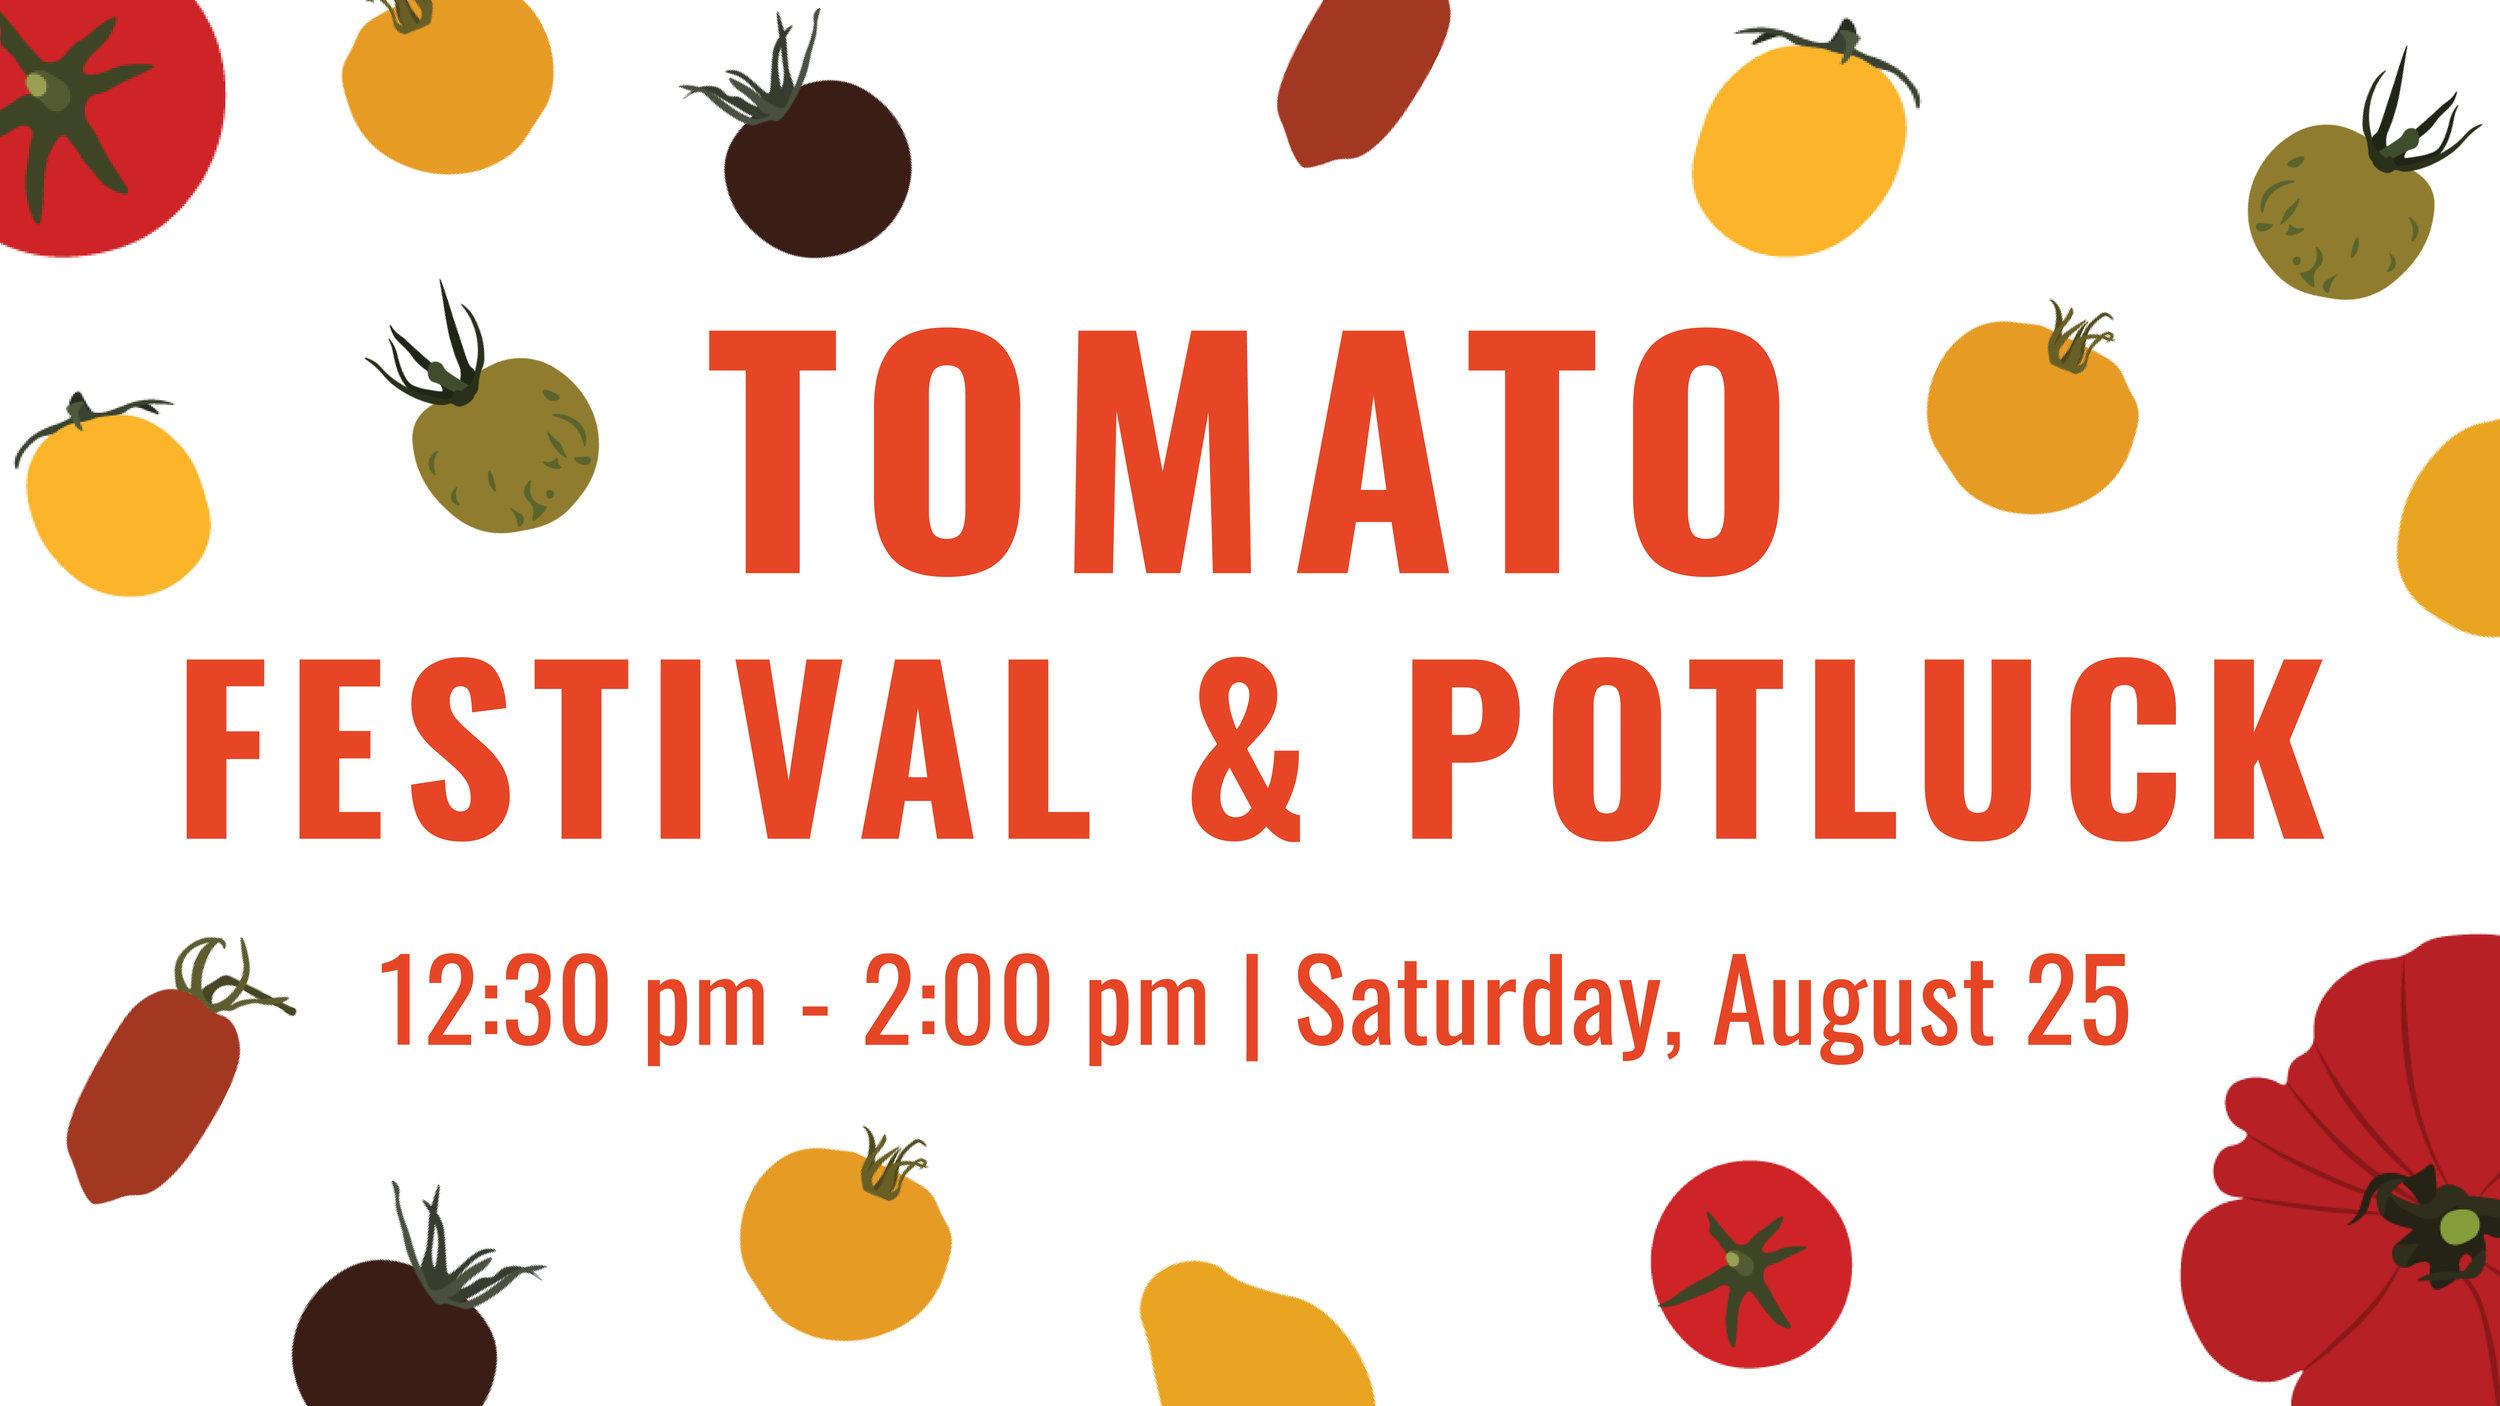 180726 Tomato Festival Facebook Event .jpg